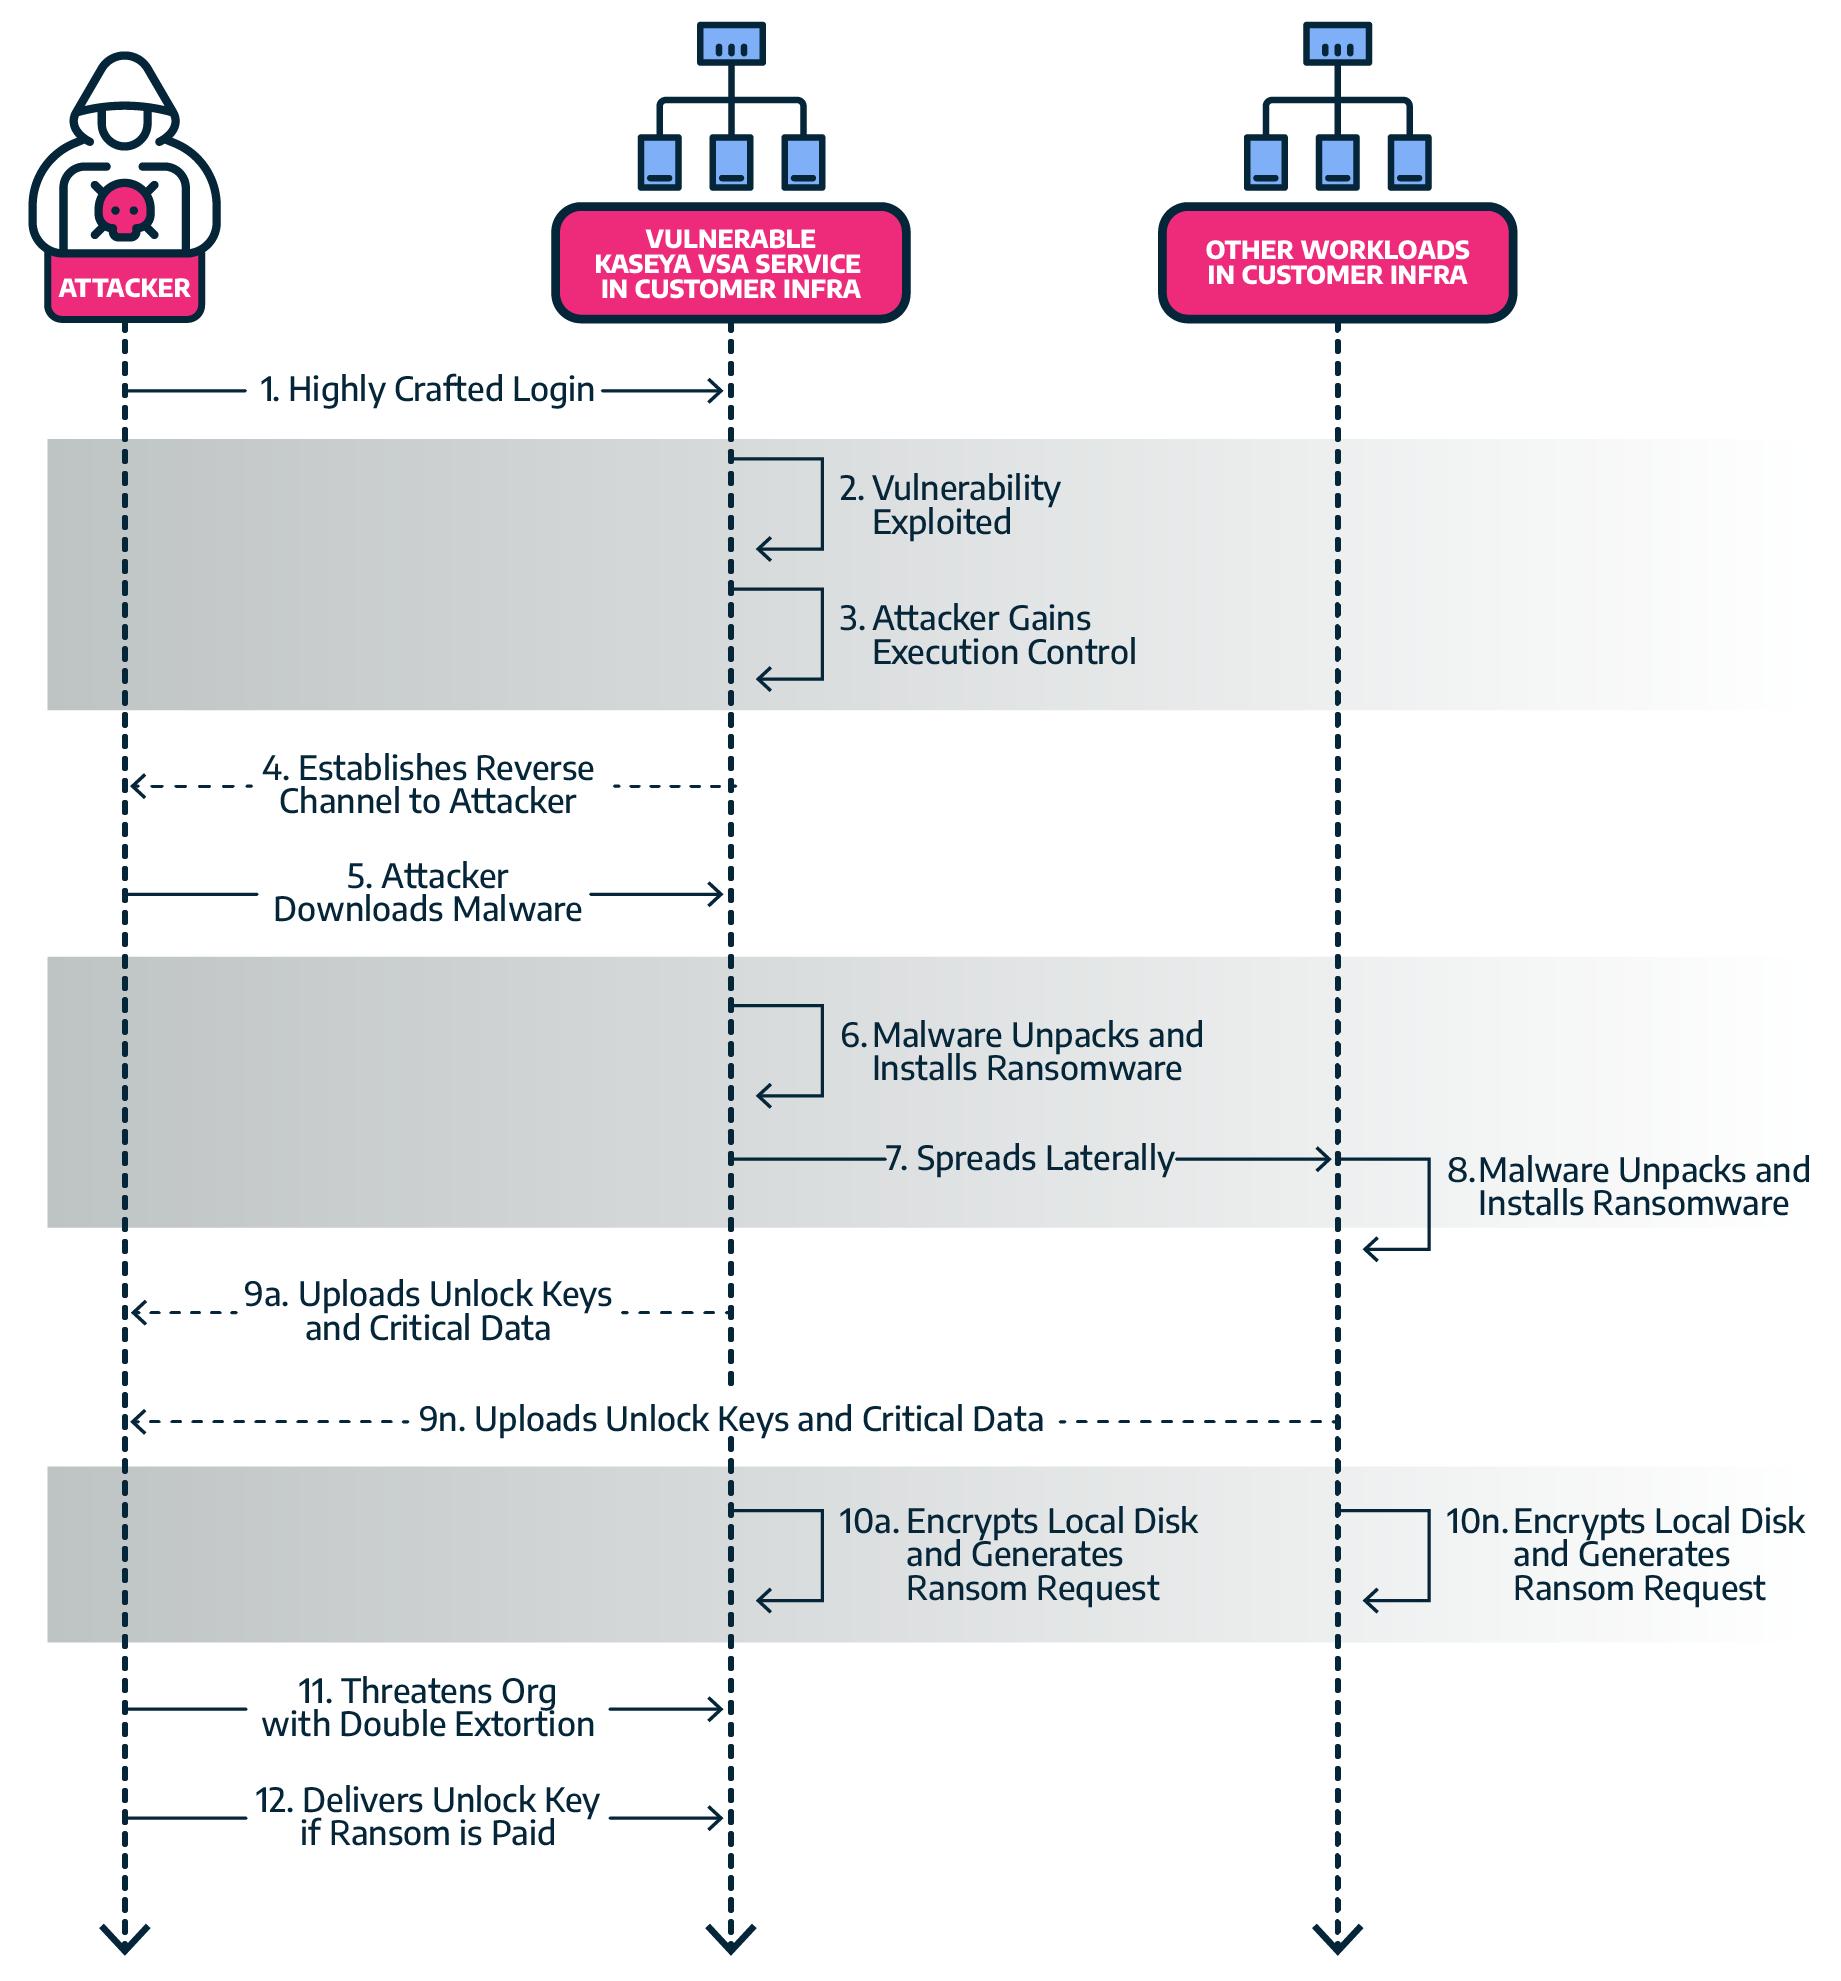 Ransomware Kaseya Attack Diagram